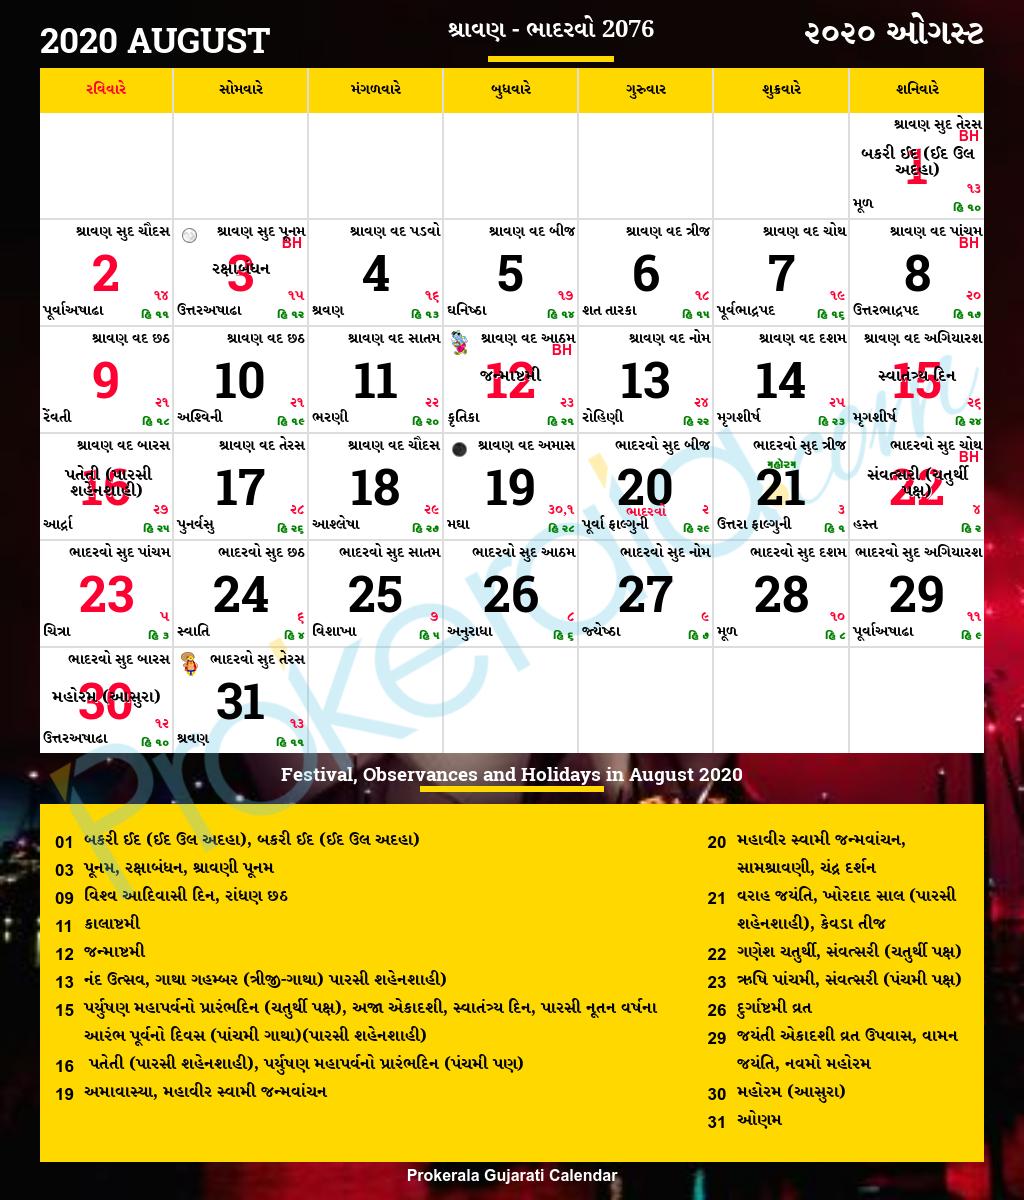 Gujarati Calendar August, 2020 | Vikram Samvat 2076 with Vikram Samvat Date Converter